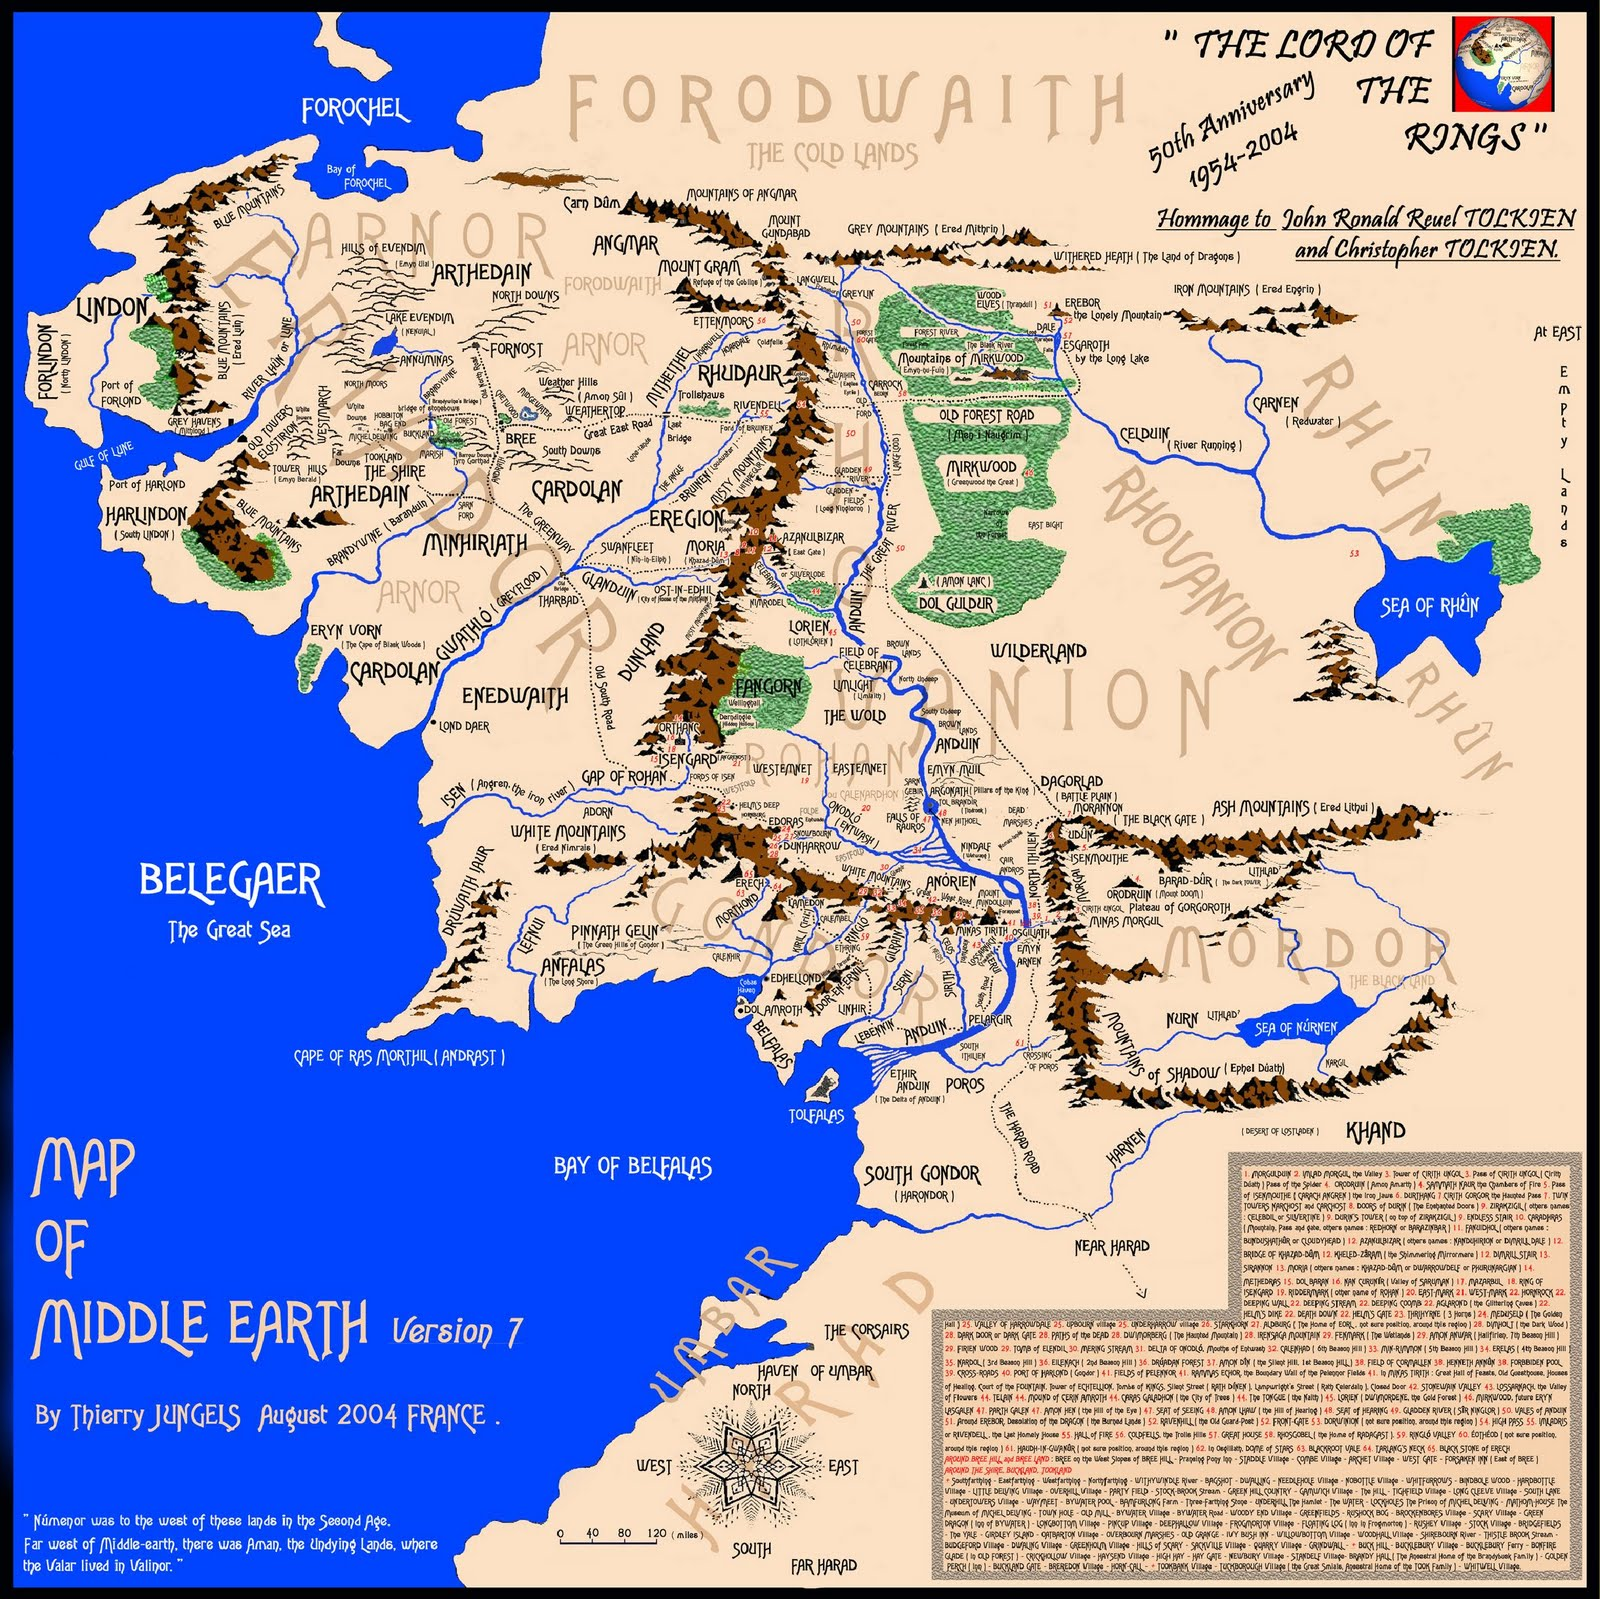 DVN61: FANTASY MAPS PART ONe